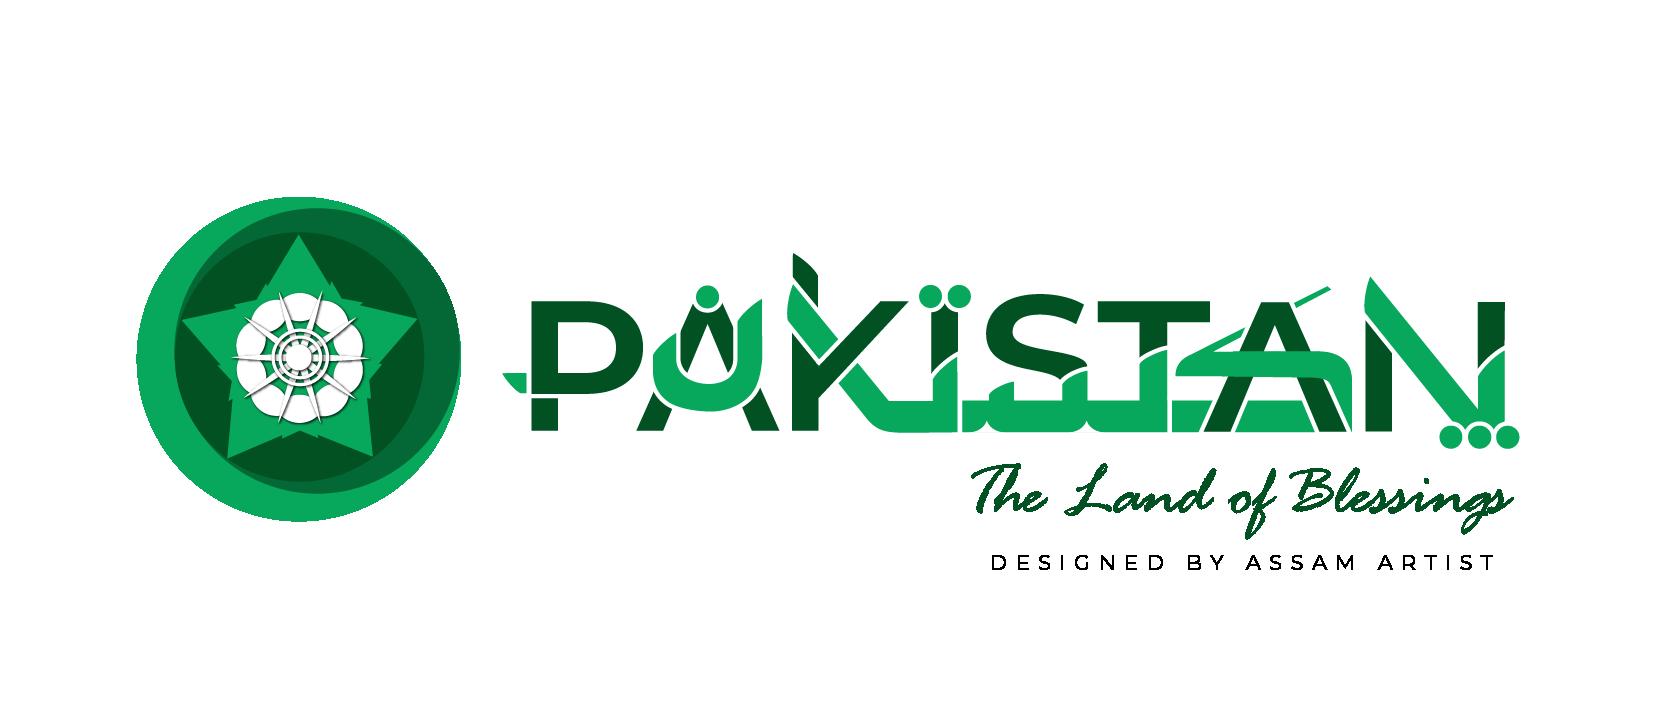 Pakistan Tourism Logo Download PNG